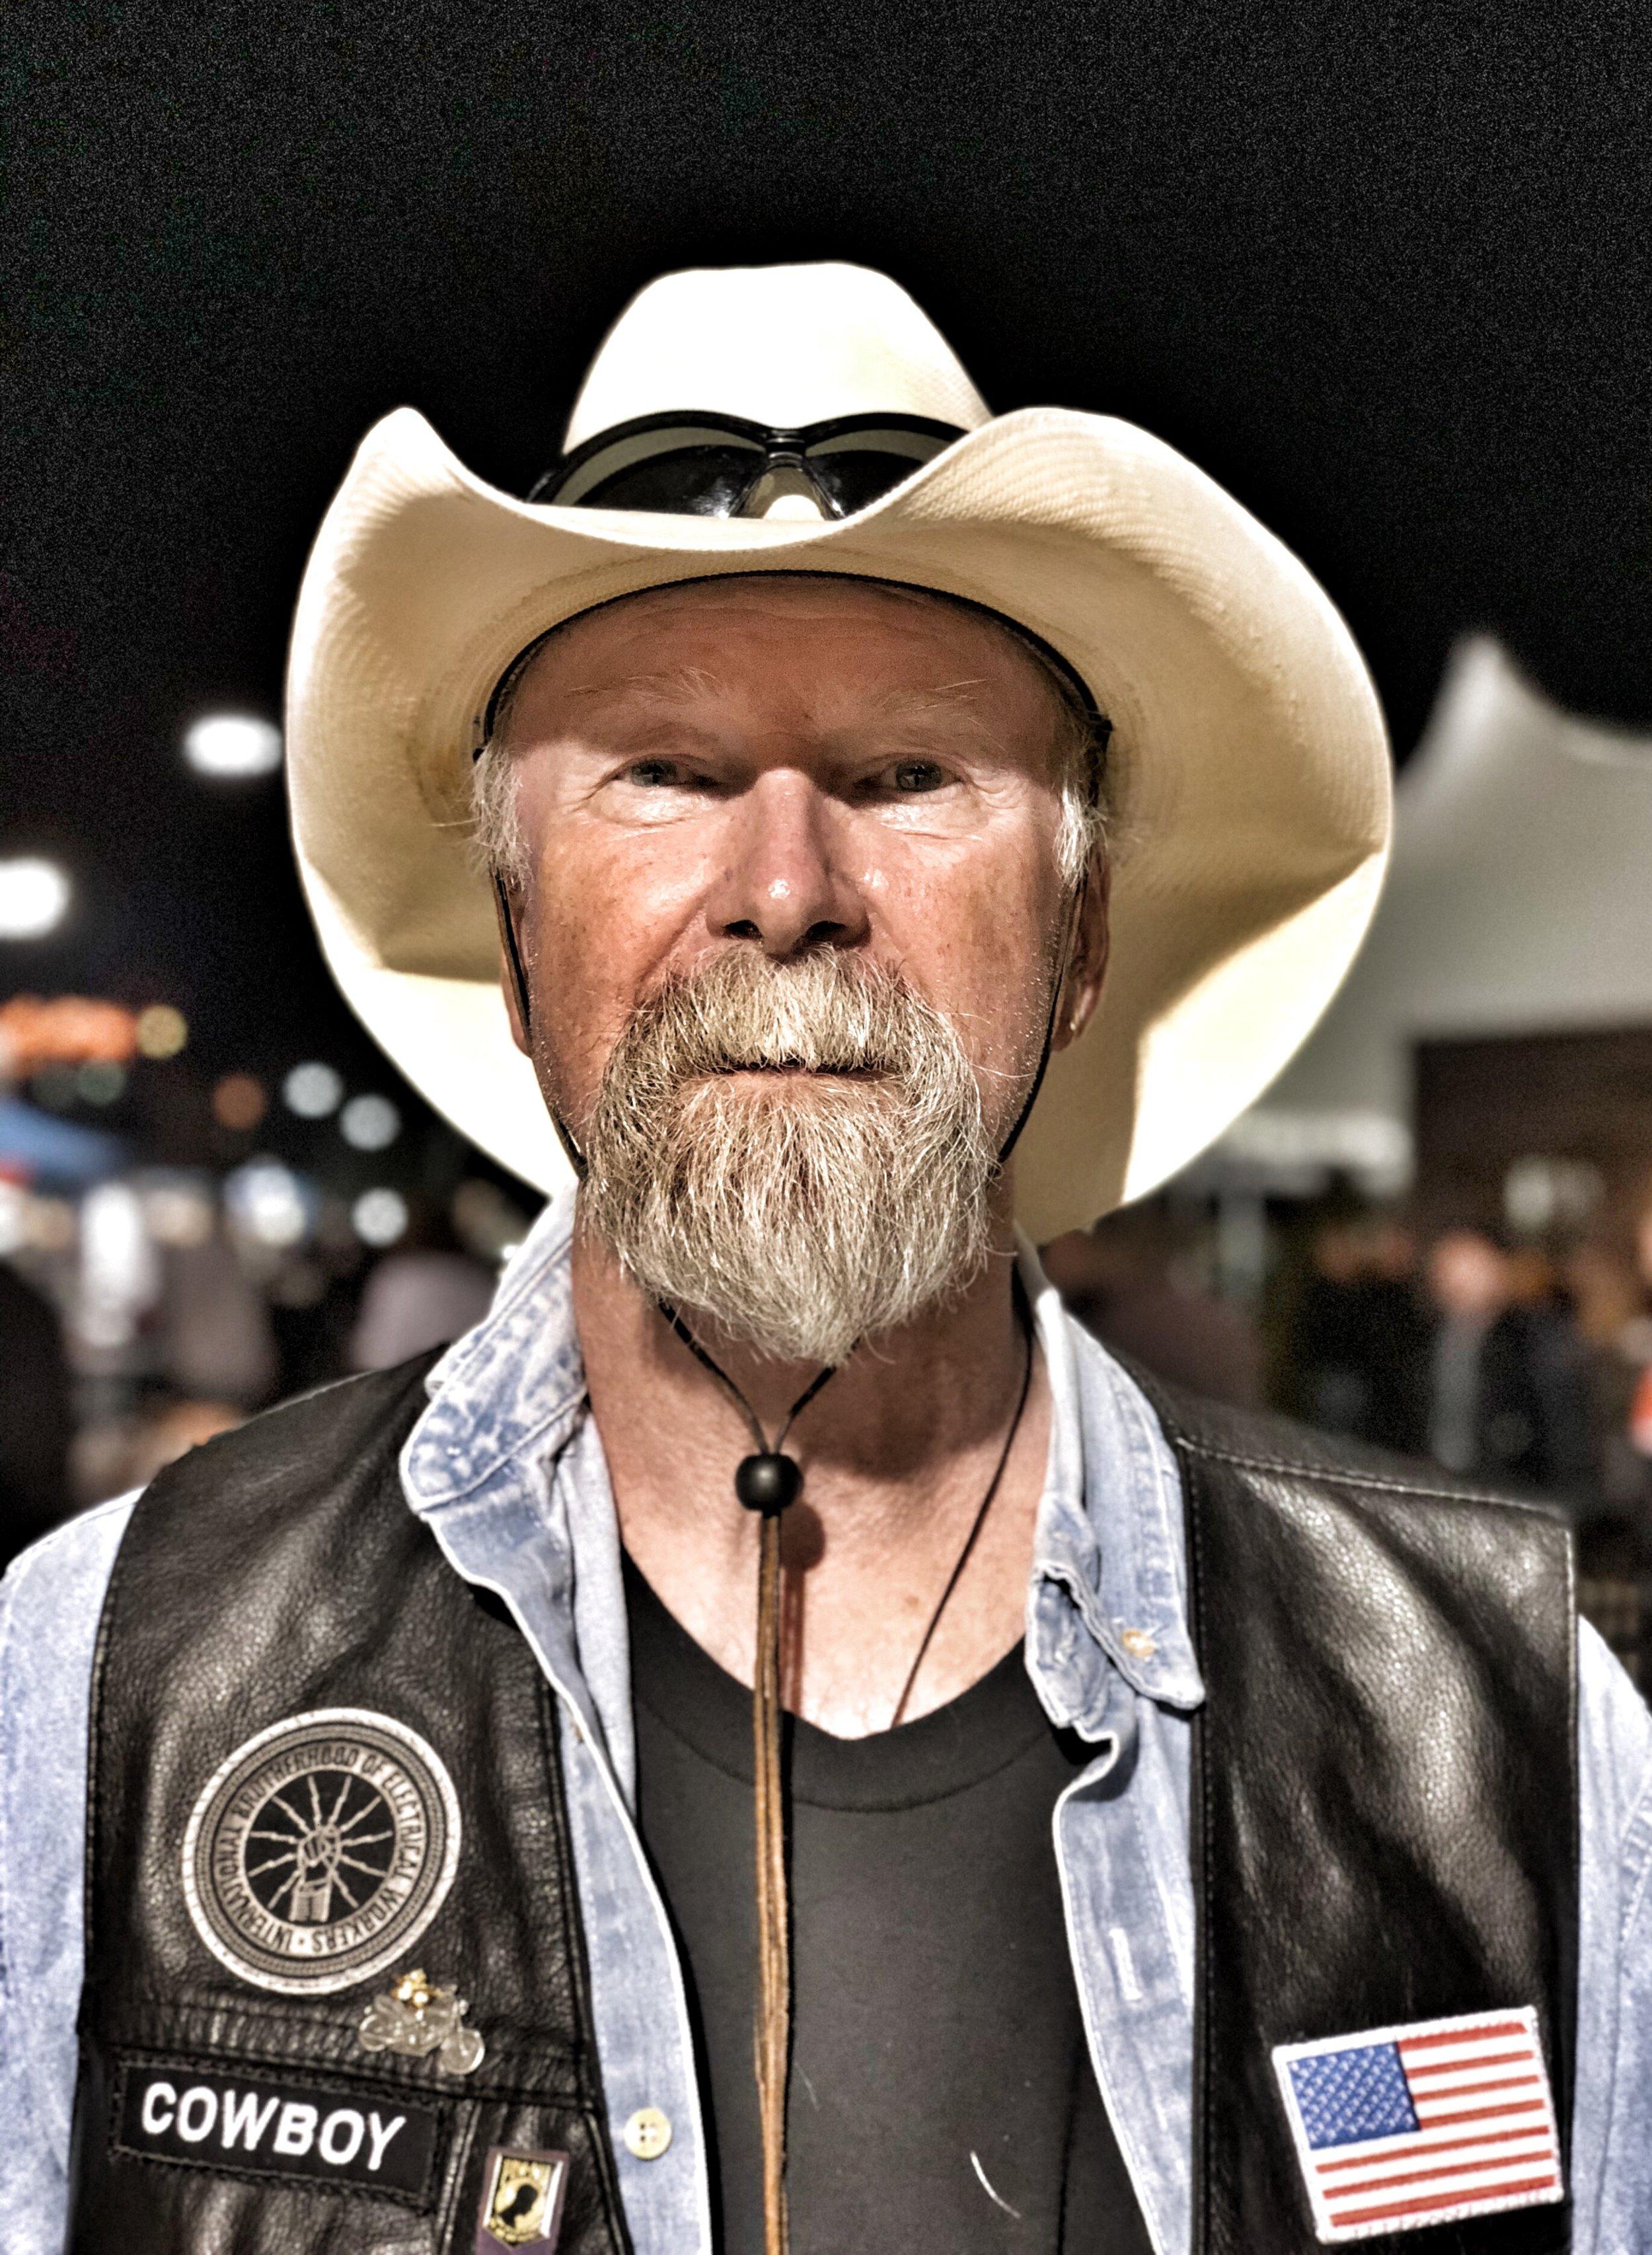 Kurt aka Cowboy: Rides a Harley Davidson